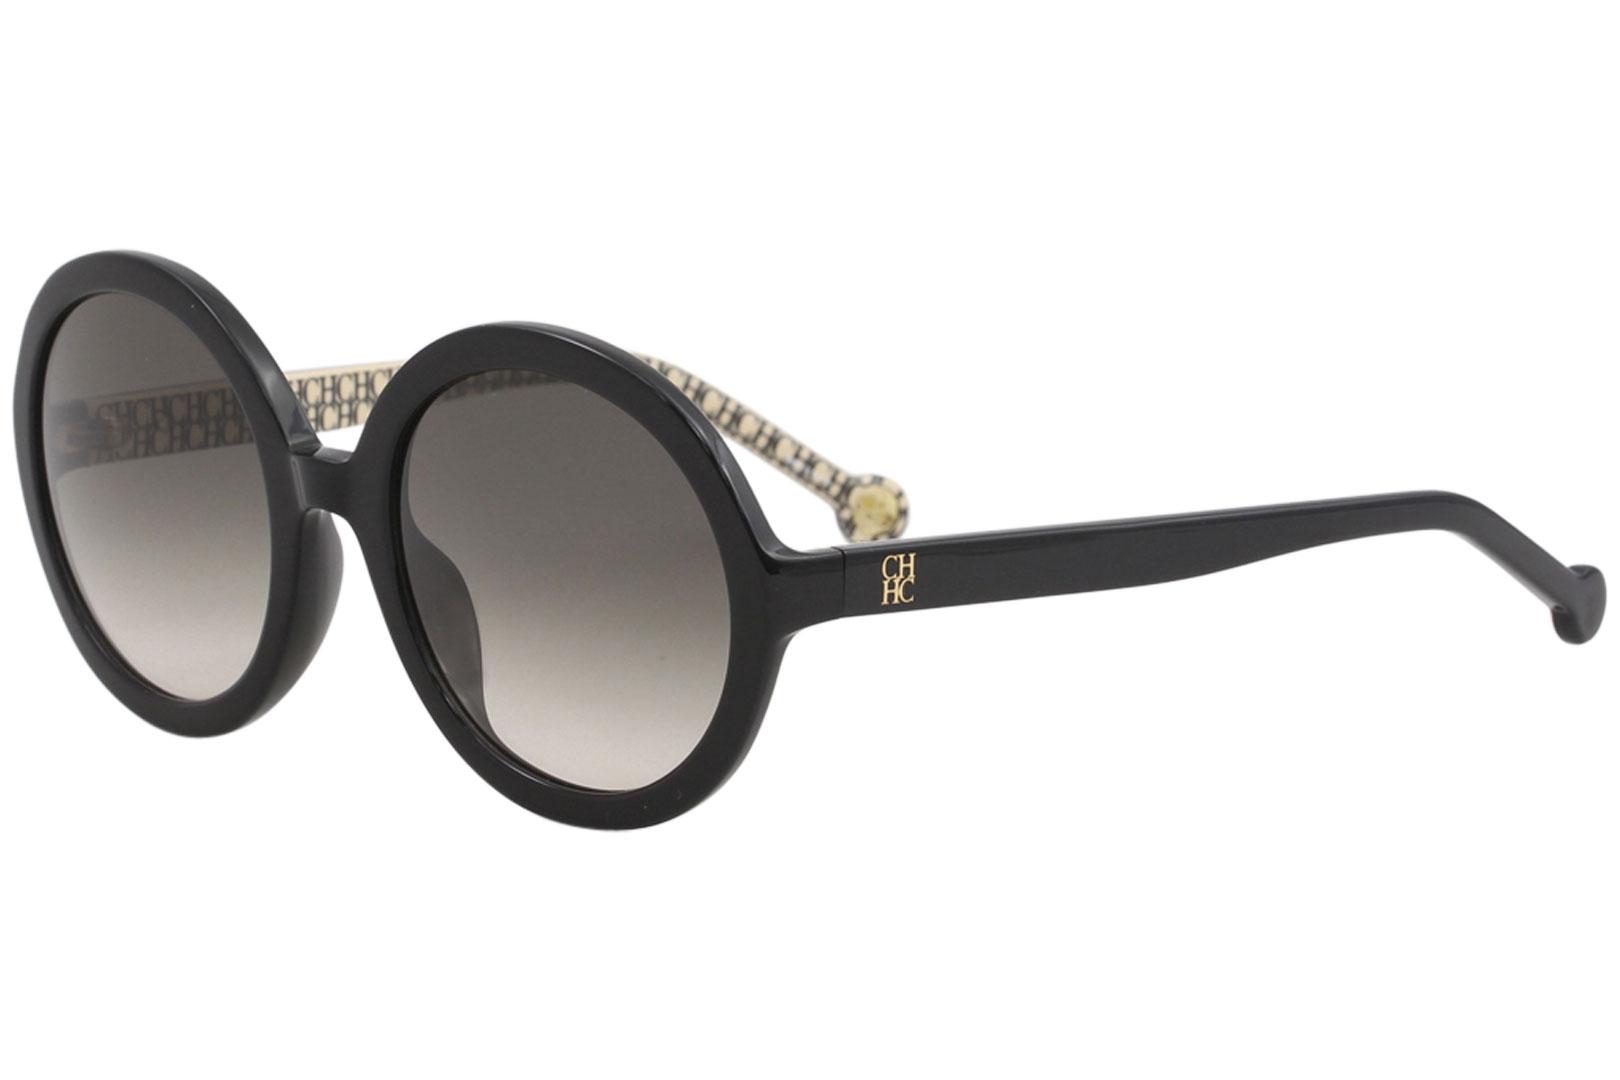 0083cceb60 CH Carolina Herrera SHE696 SHE 696 0700 Shiny Black Round Sunglasses ...